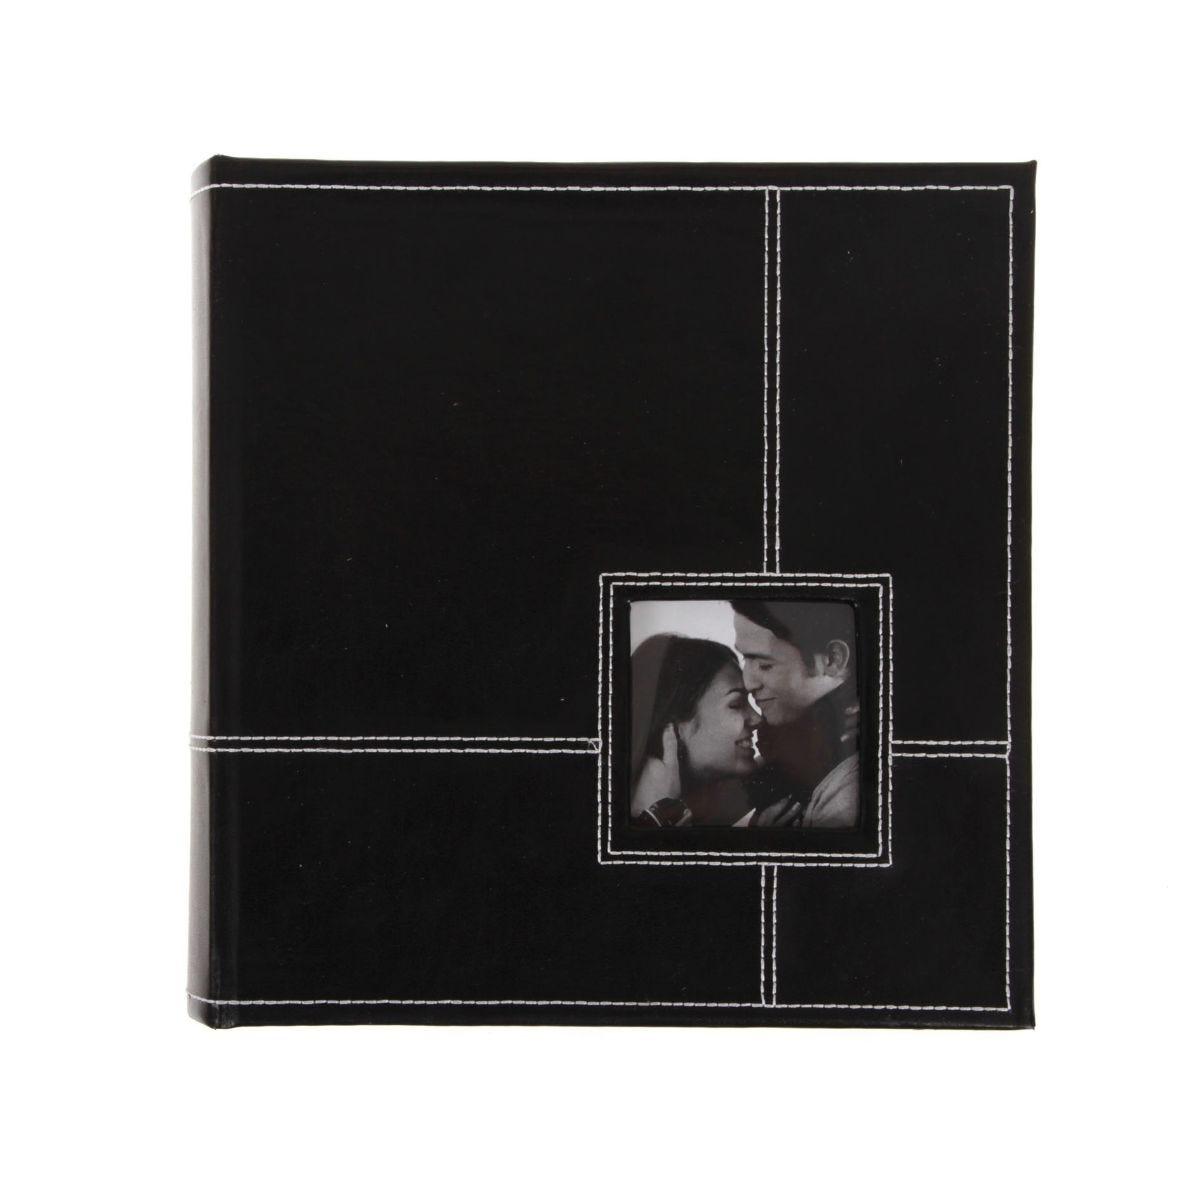 Image of Kenro Sonata Classic Album 200 6x4 Print, Blk